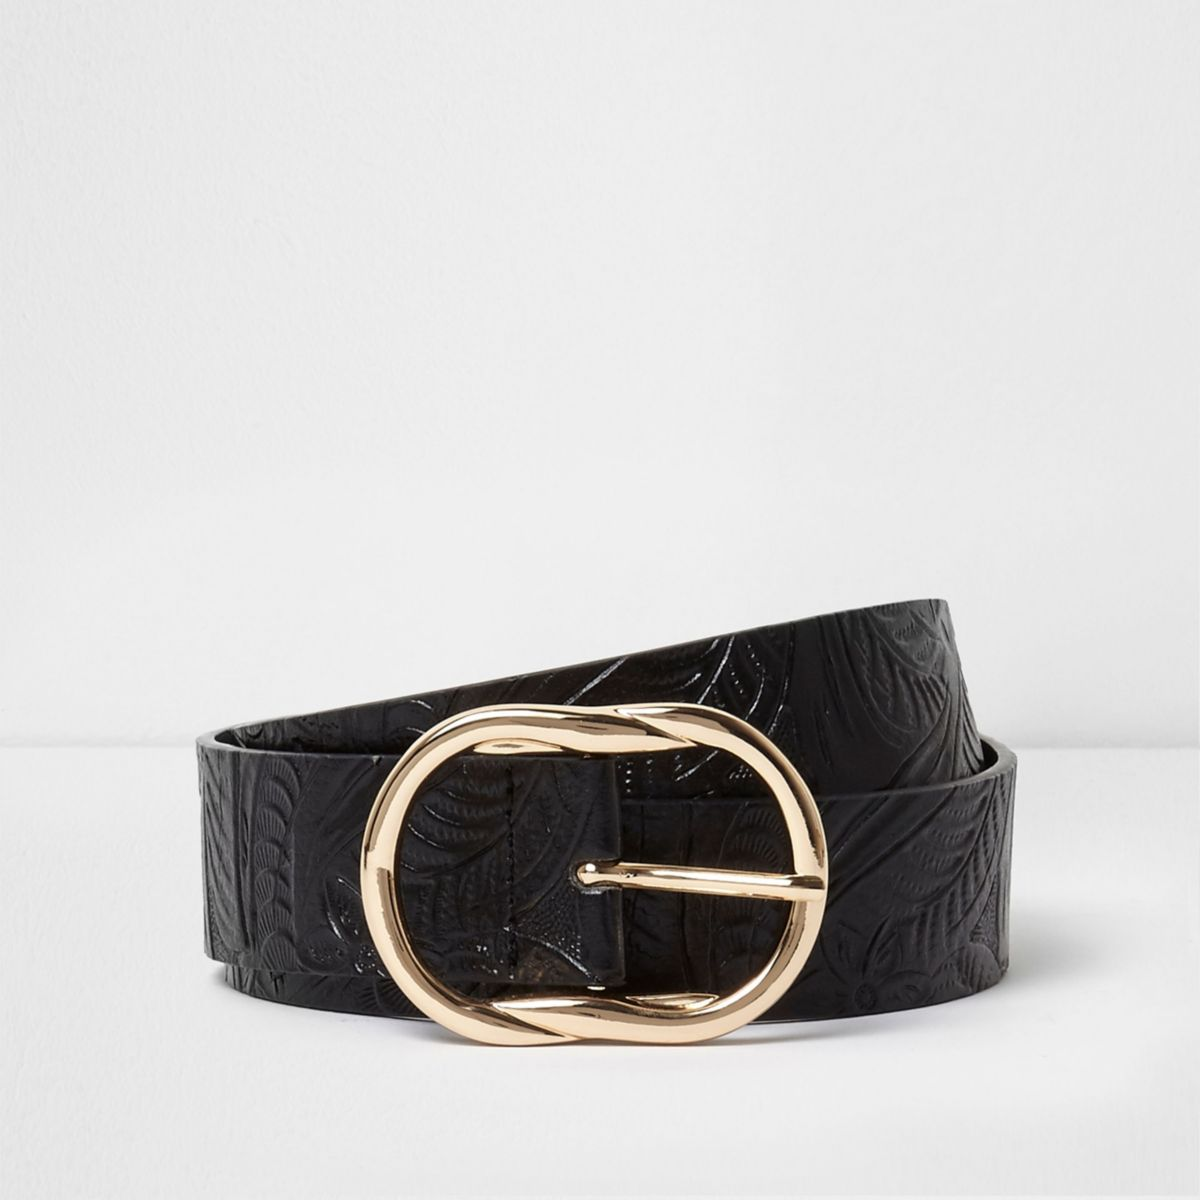 Black floral embossed faux leather jeans belt